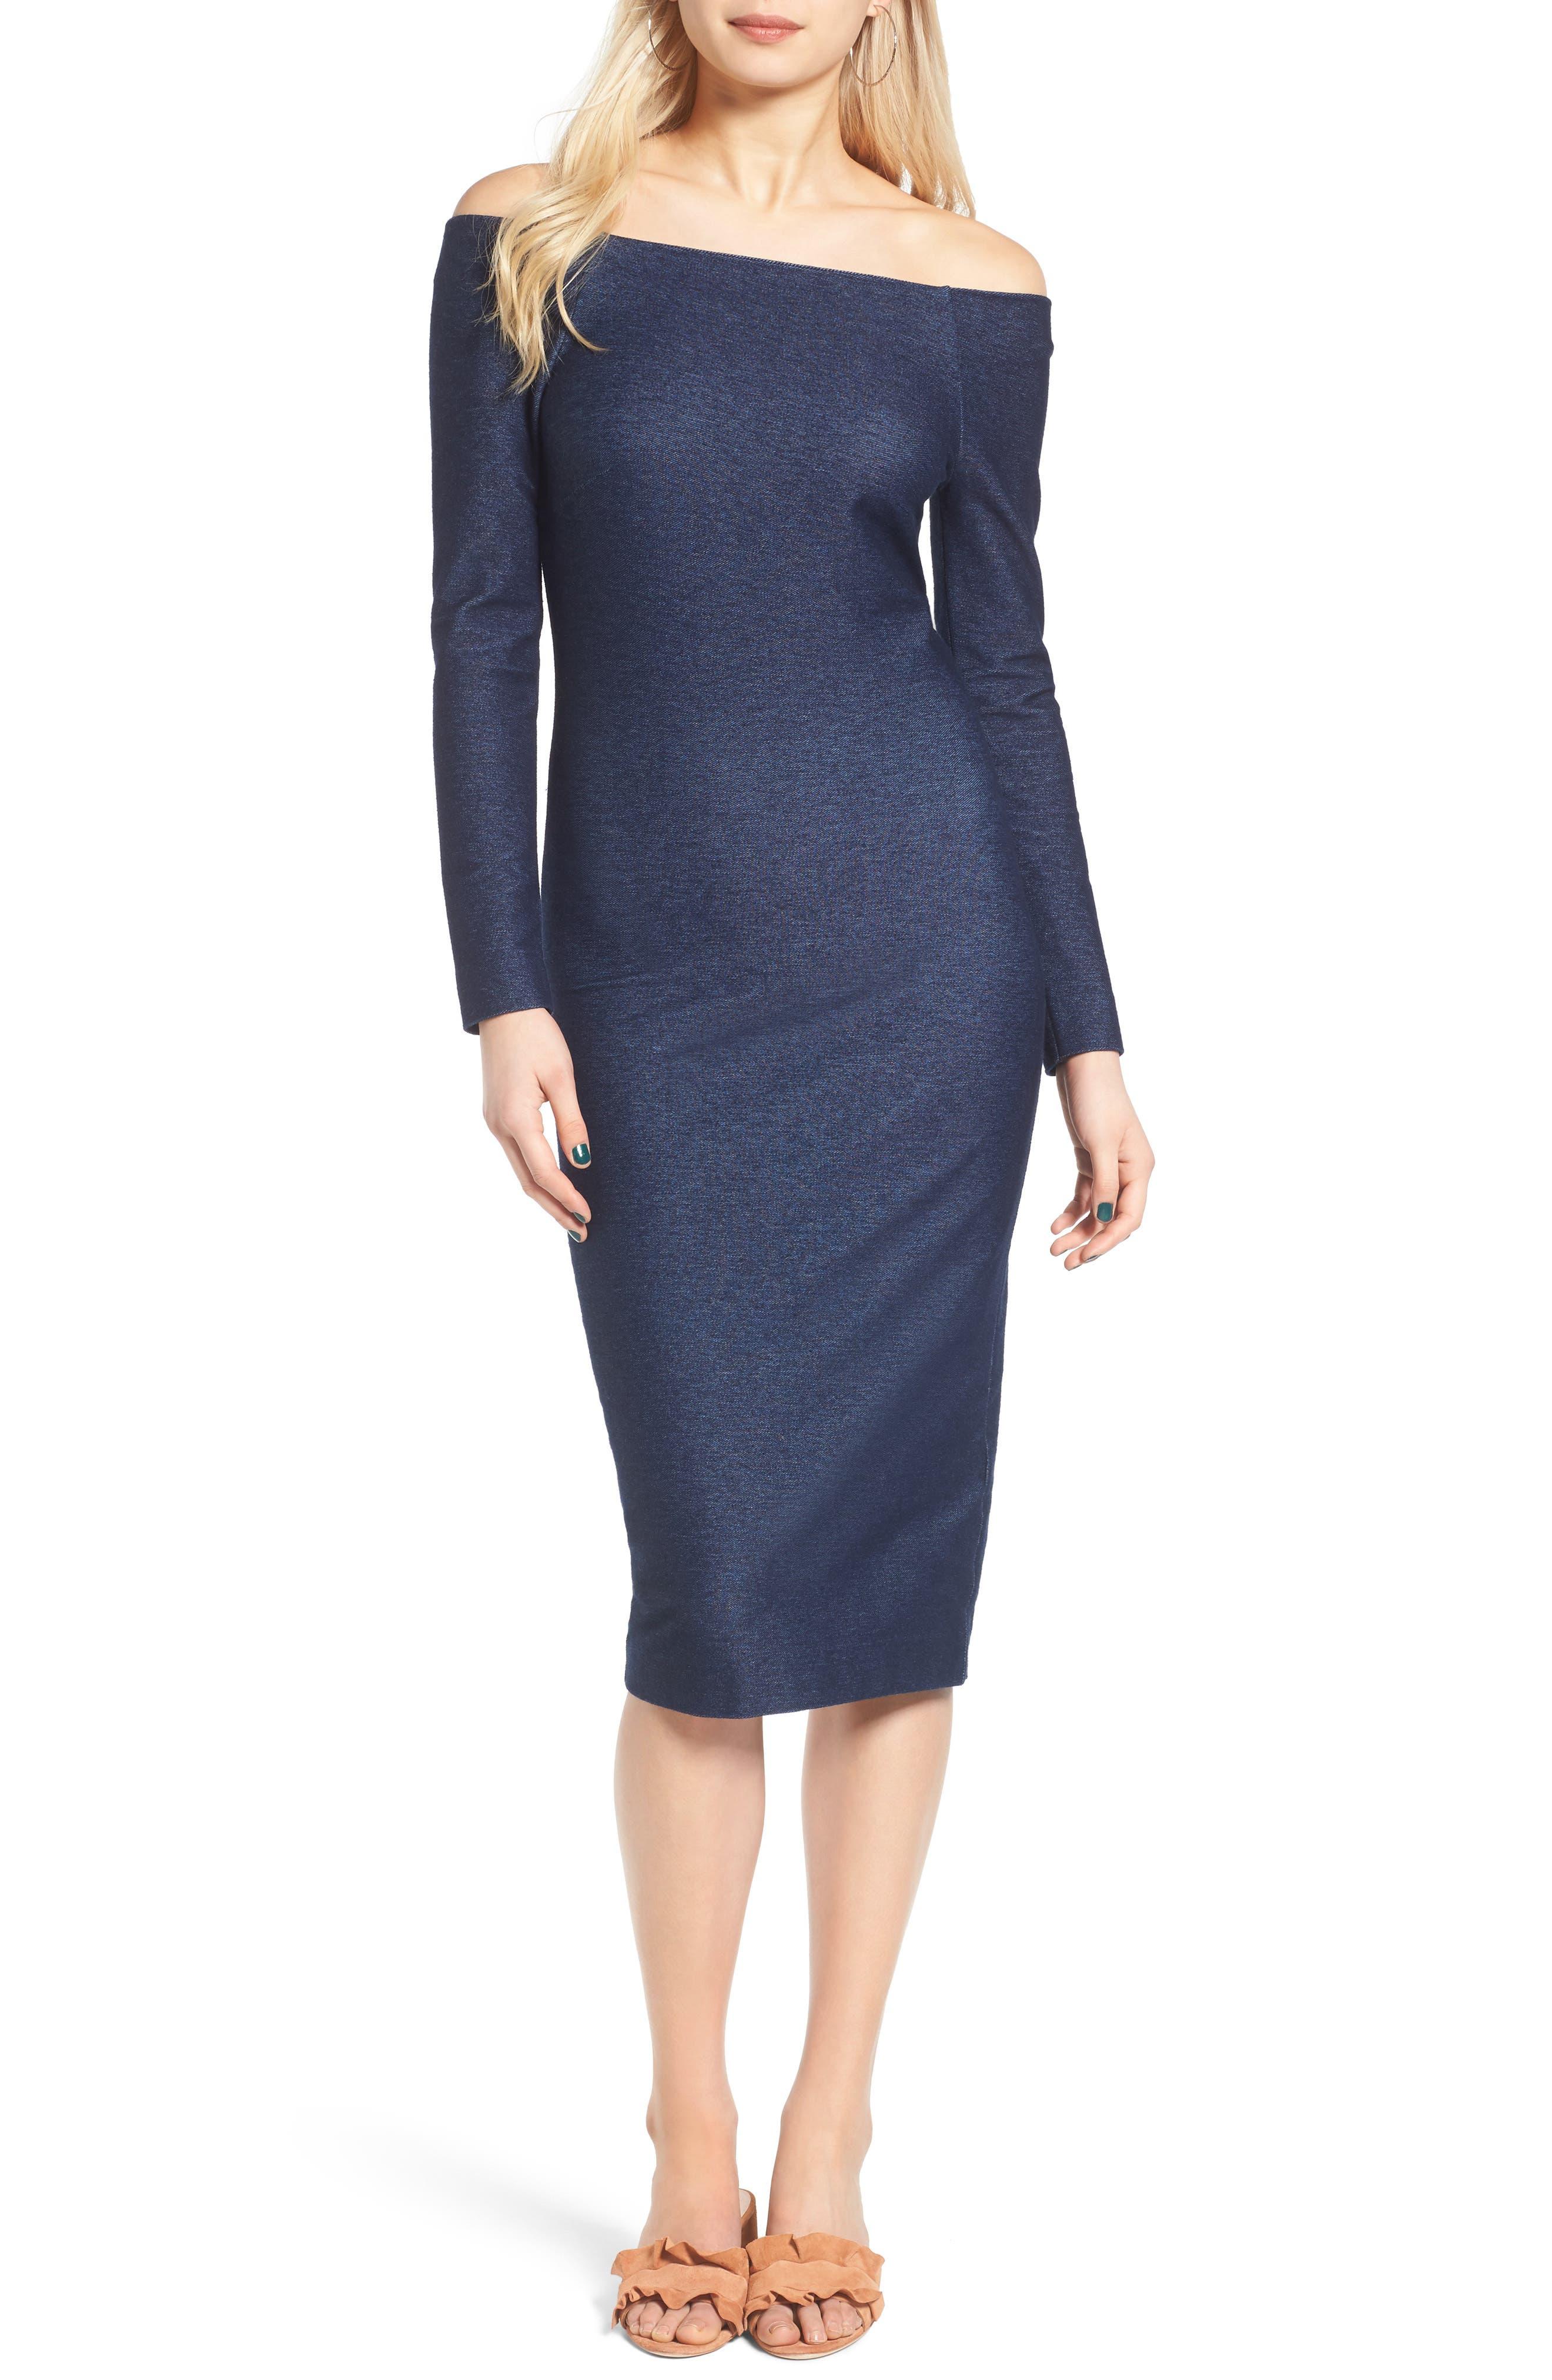 ST. studio Denim Off the Shoulder Body-Con Dress